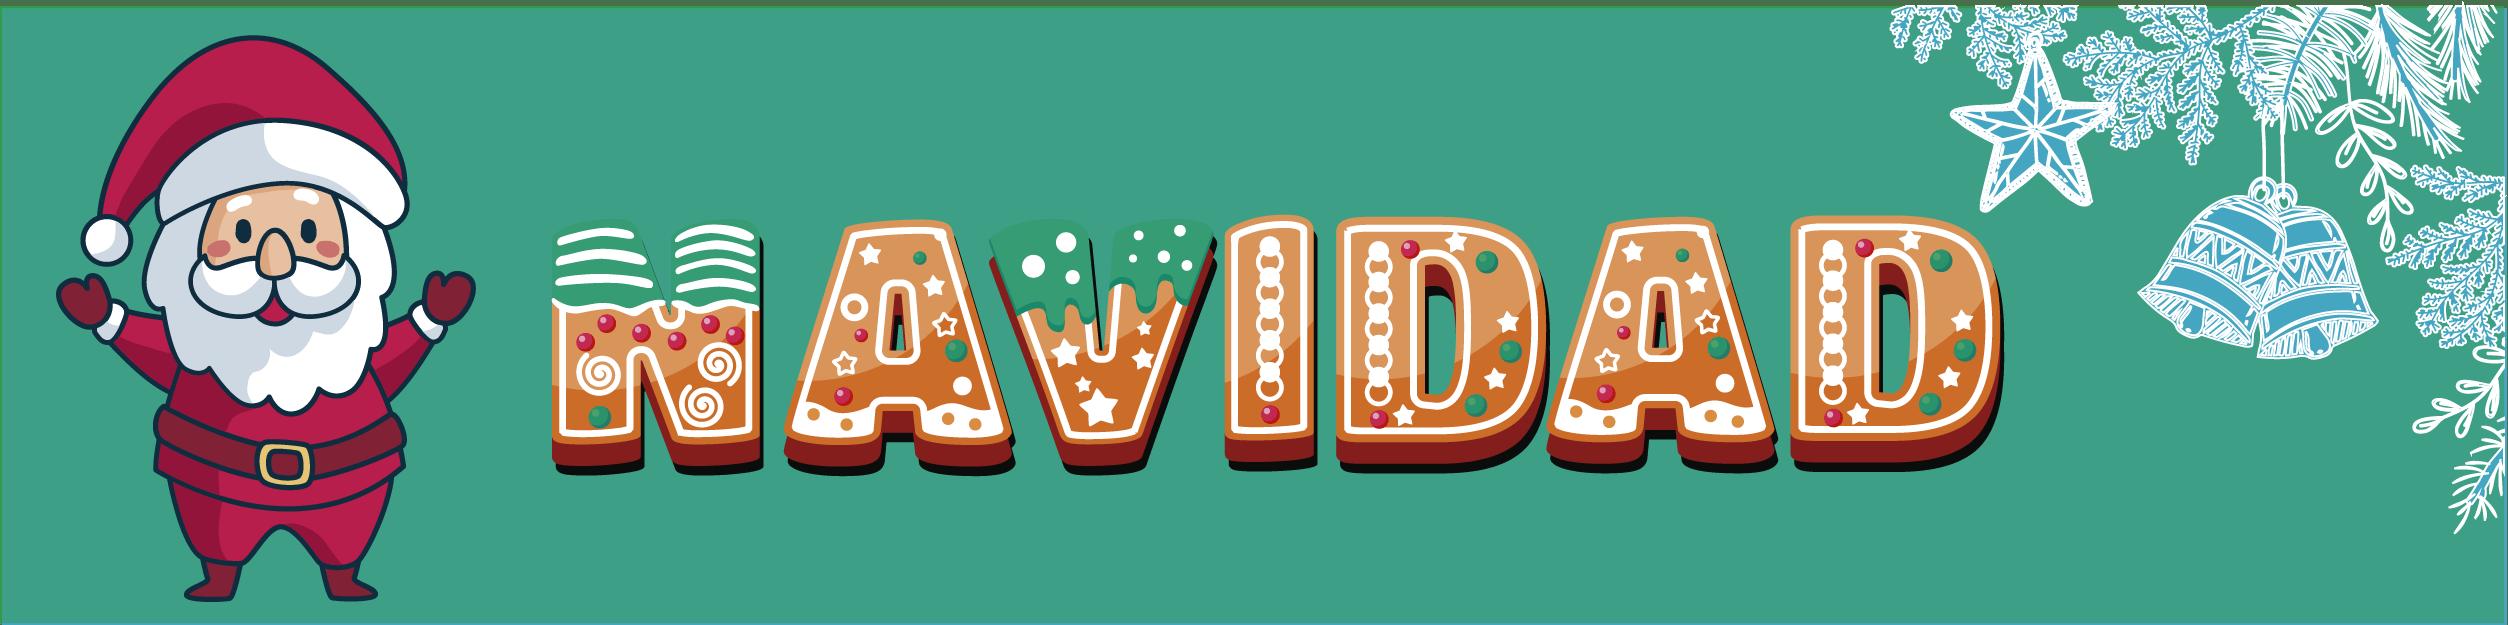 NAVIDAD-01